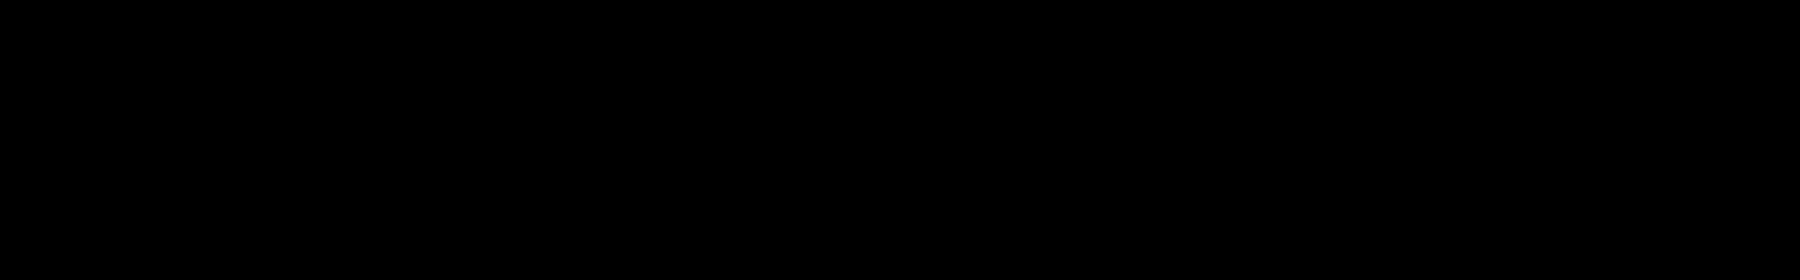 Eclipse - Dark Ambient Samples & Drones audio waveform